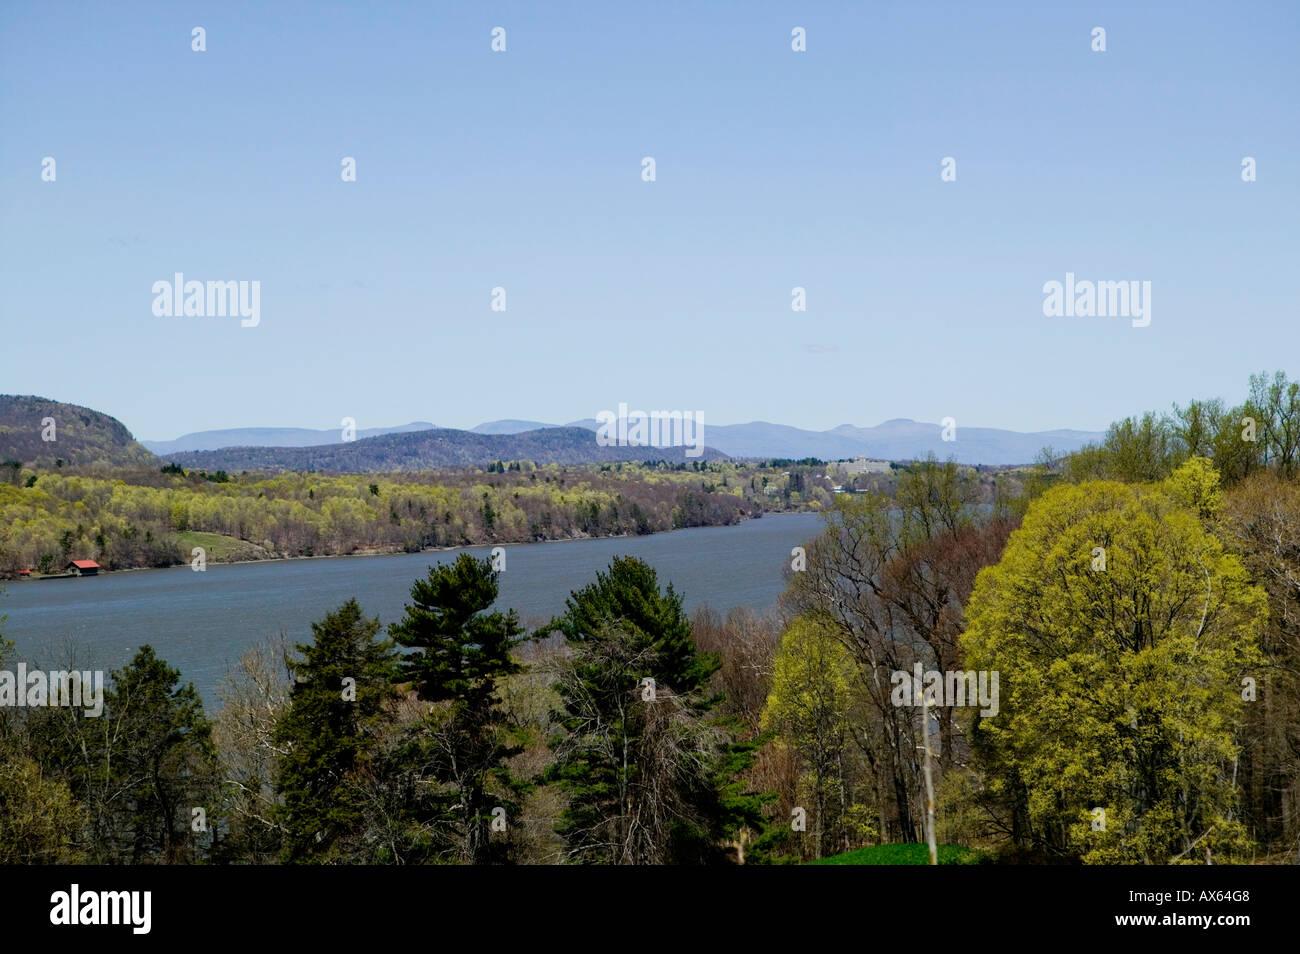 View of Hudson River from Vanderbilt mansion grounds Hyde Park New York - Stock Image